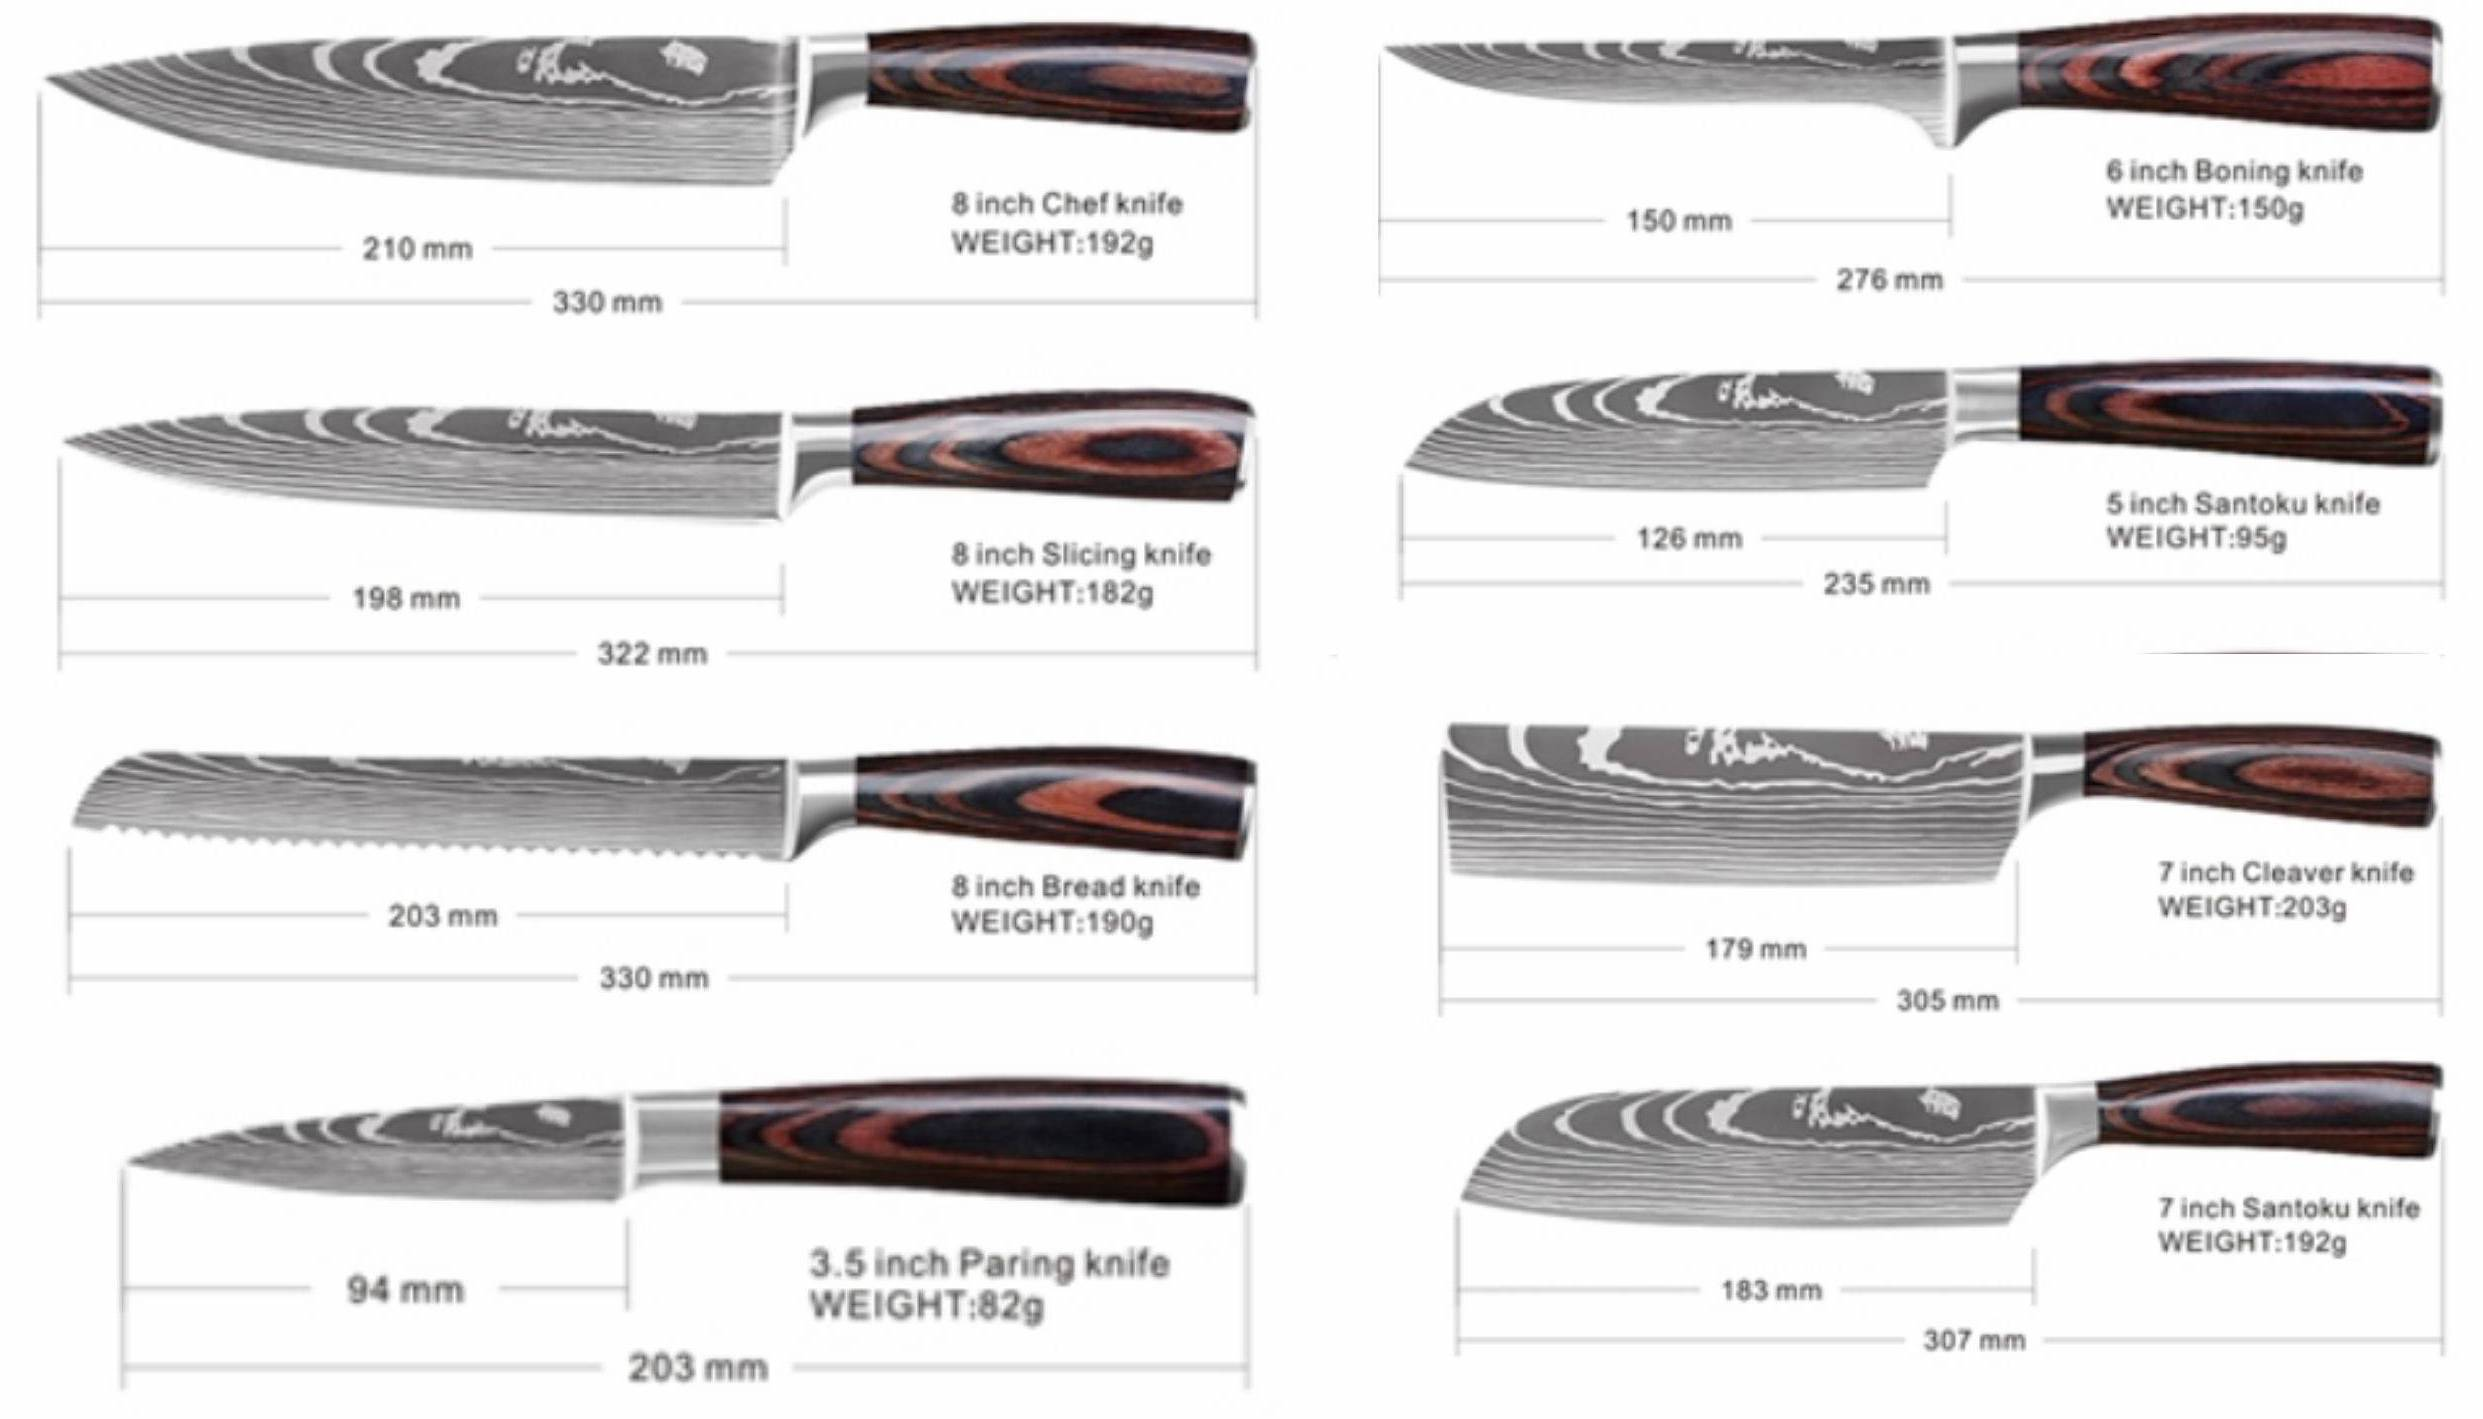 Best Professional Kitchen Knives, Best Kitchen Knife Set, Japanese Chef Knife Set, Damascus Knives,